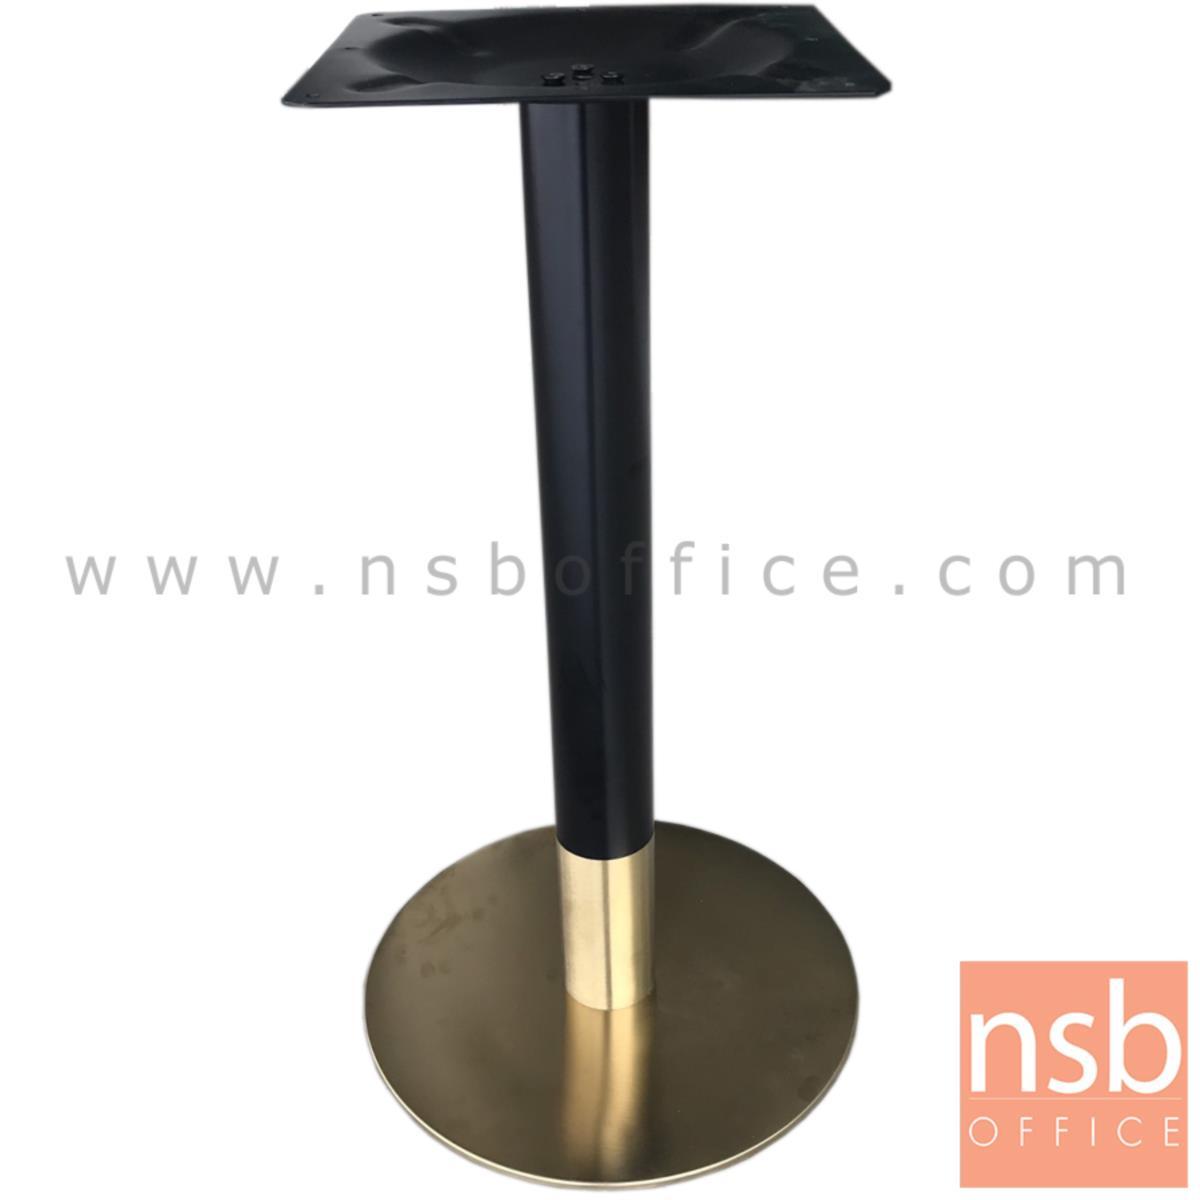 A14A226:ขาโต๊ะบาร์จานกลม (สีดำ-ทอง) BLACKGOLD